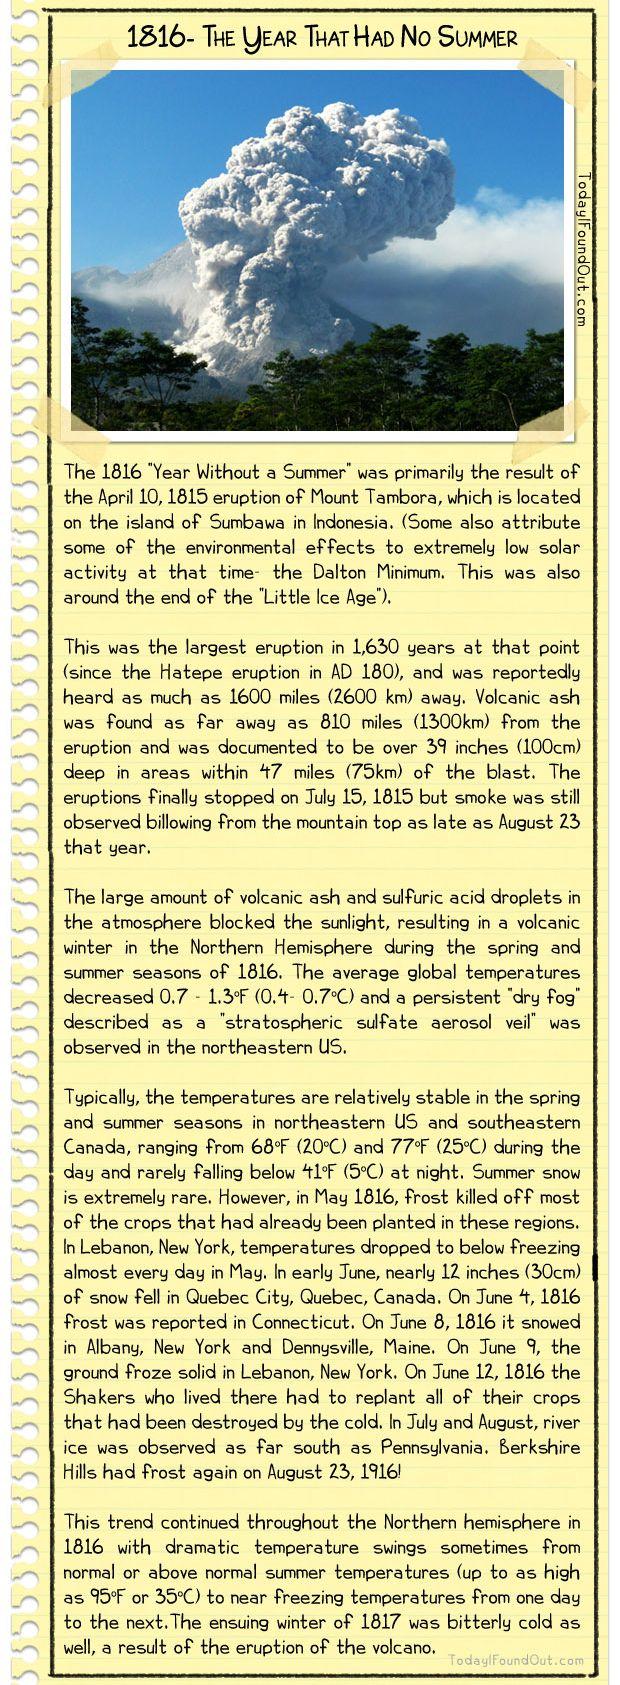 Random Facts, part 2